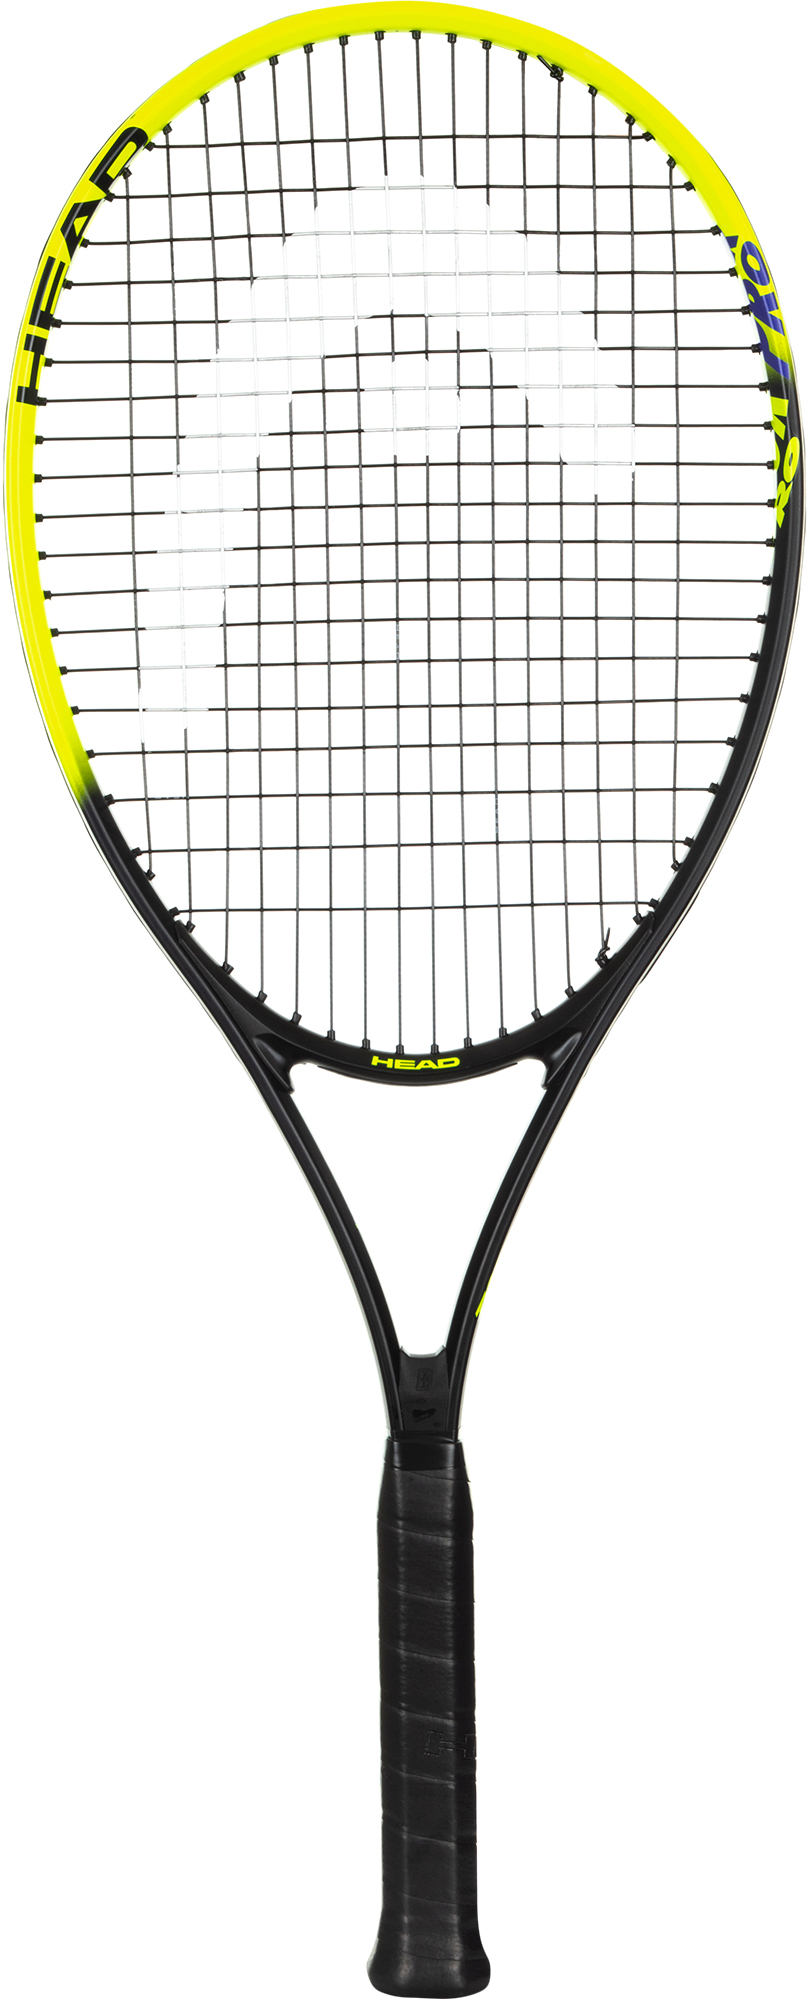 Head Ракетка для большого тенниса Head Tour Pro, размер 3